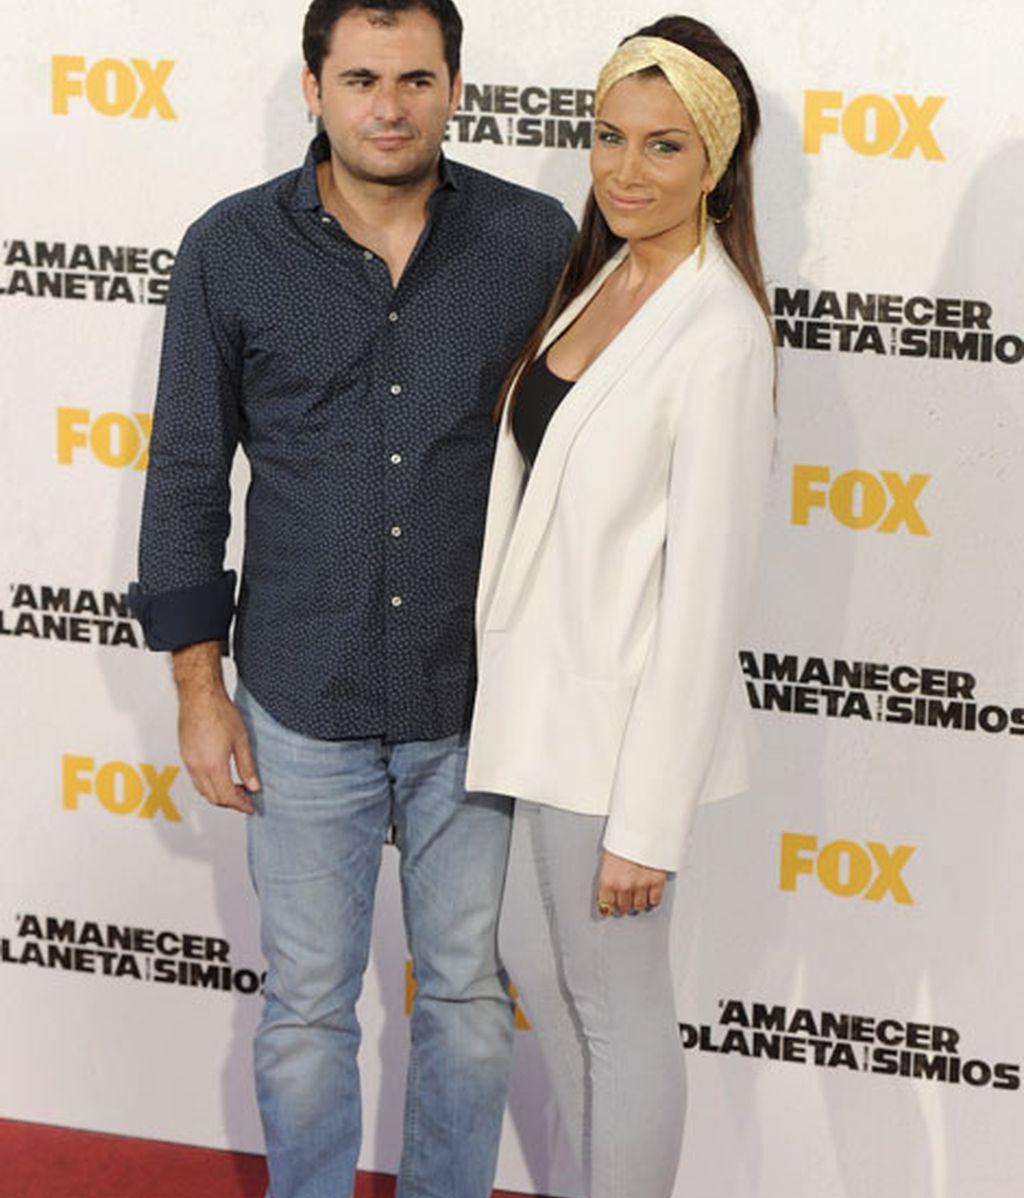 El joyero Emiliano Suárez y su novia Jacqueline Sastre